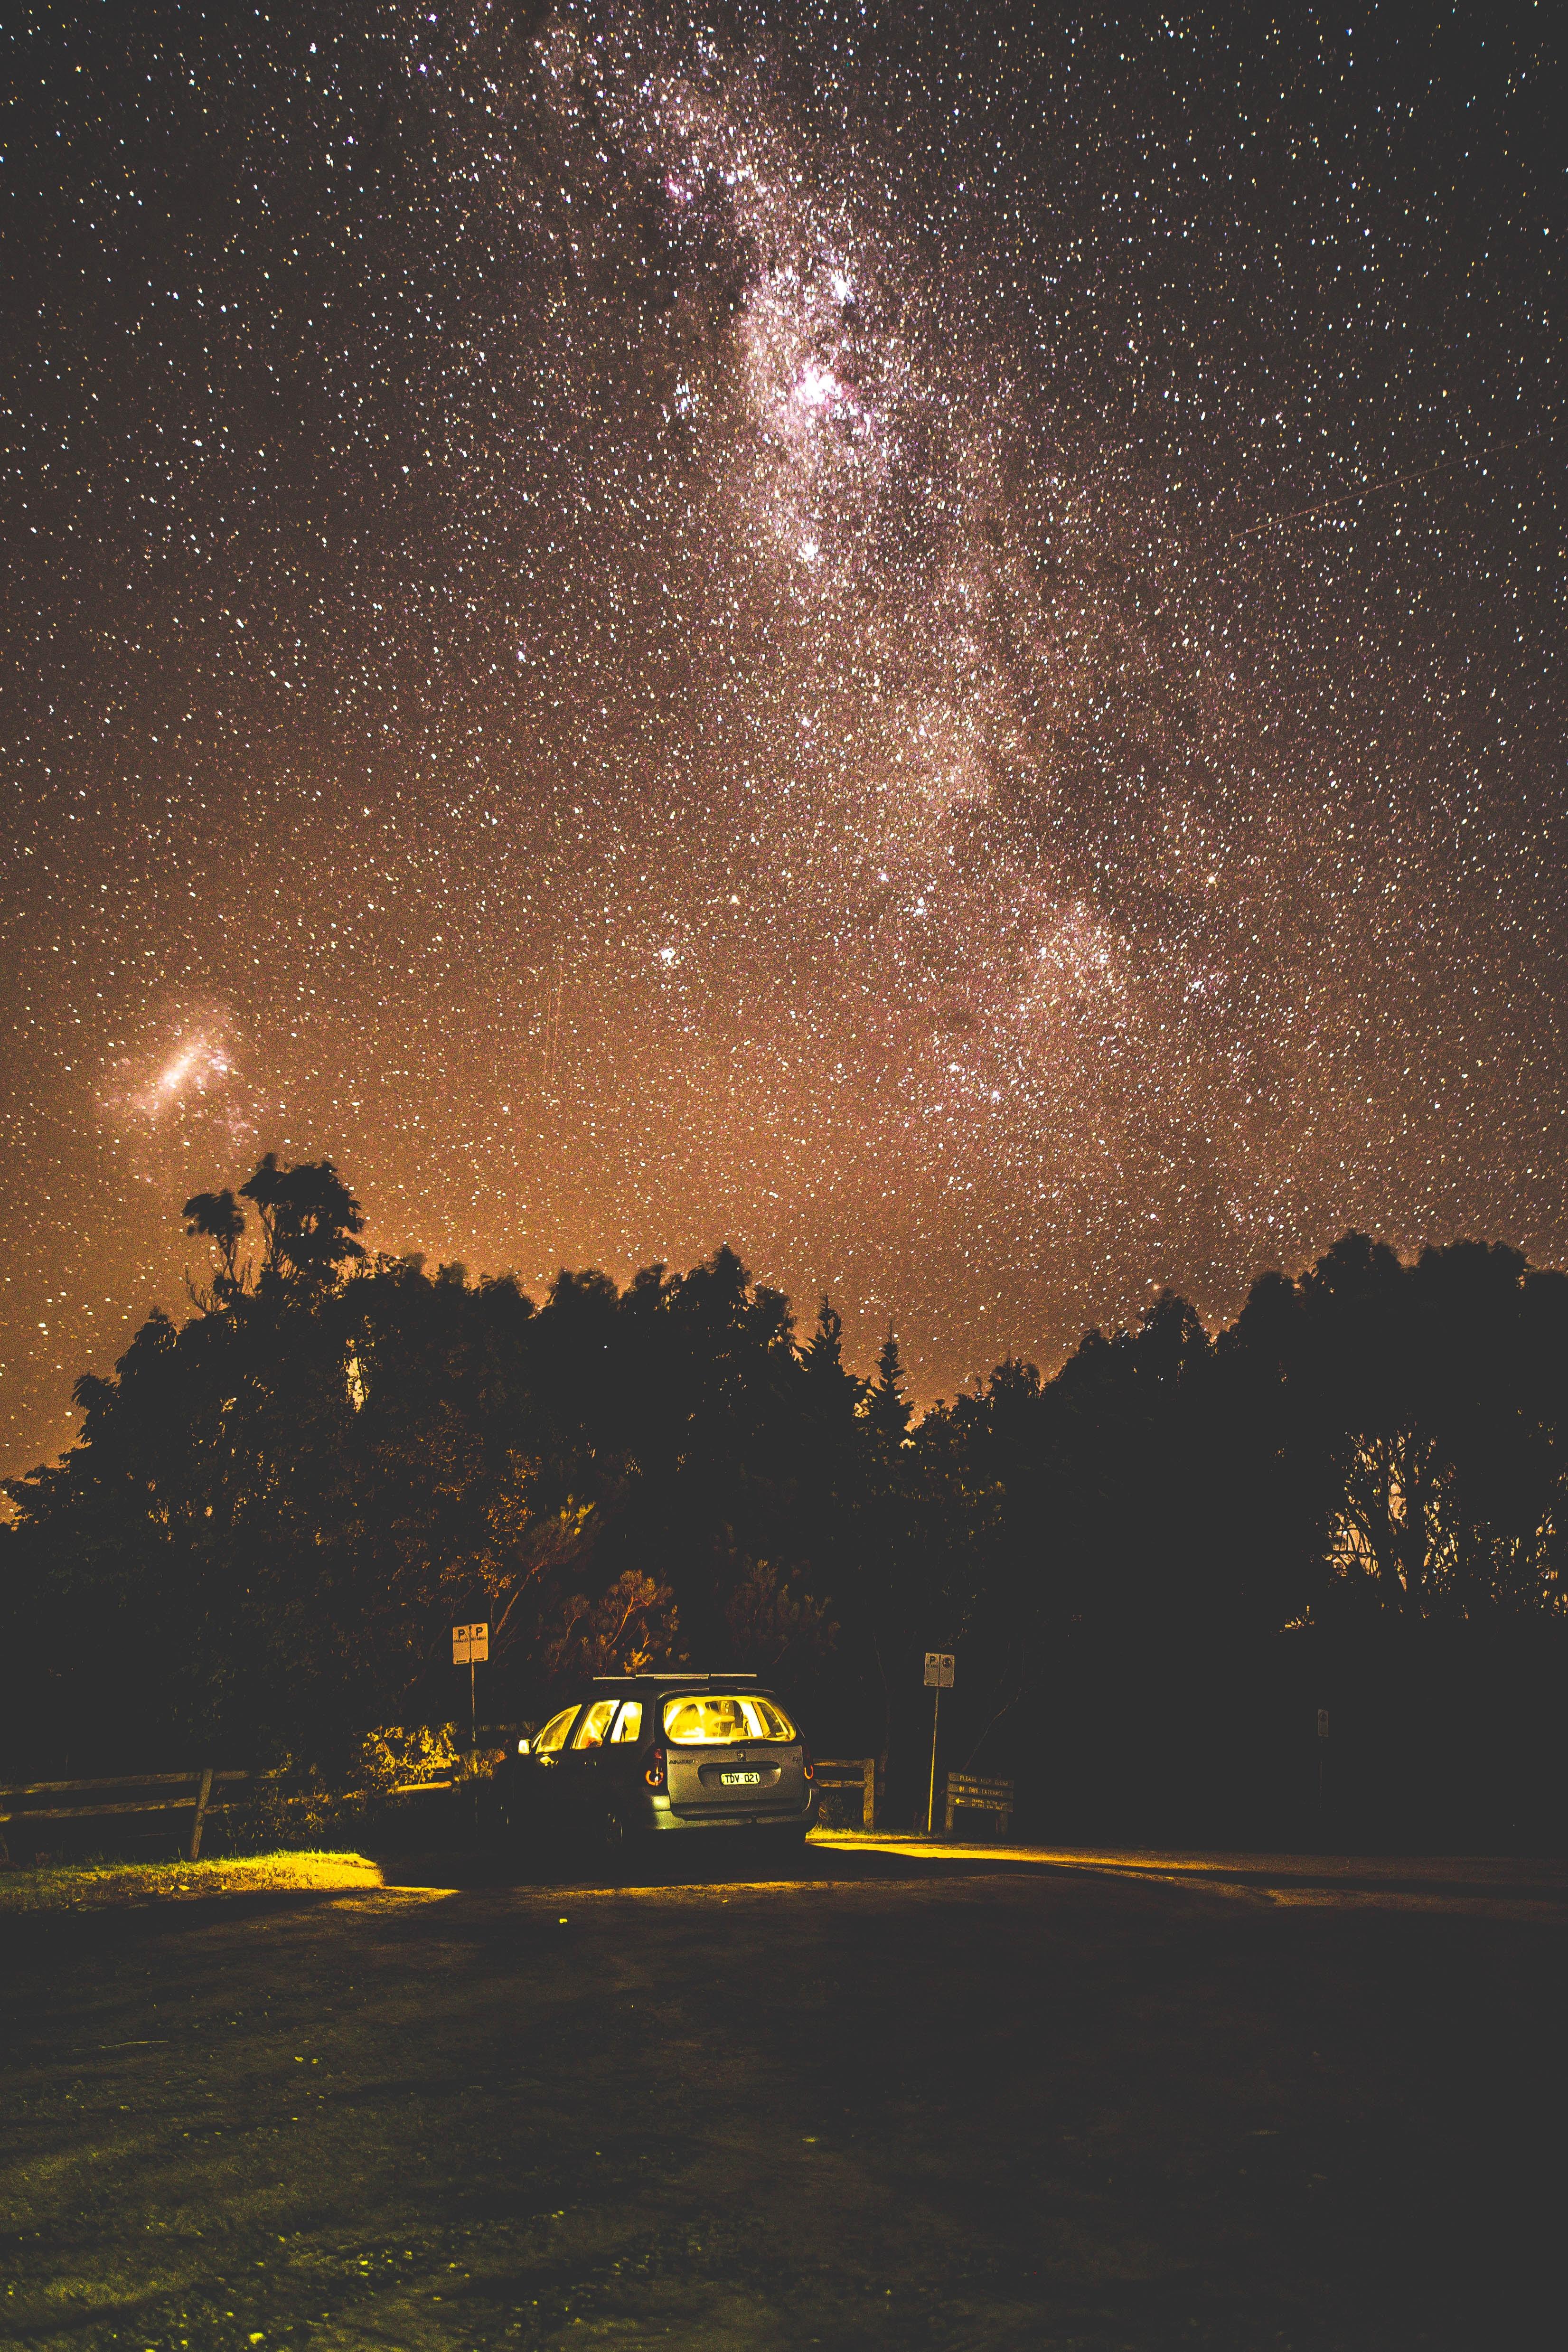 Lights inside a car parked near a forest under a starry evening sky